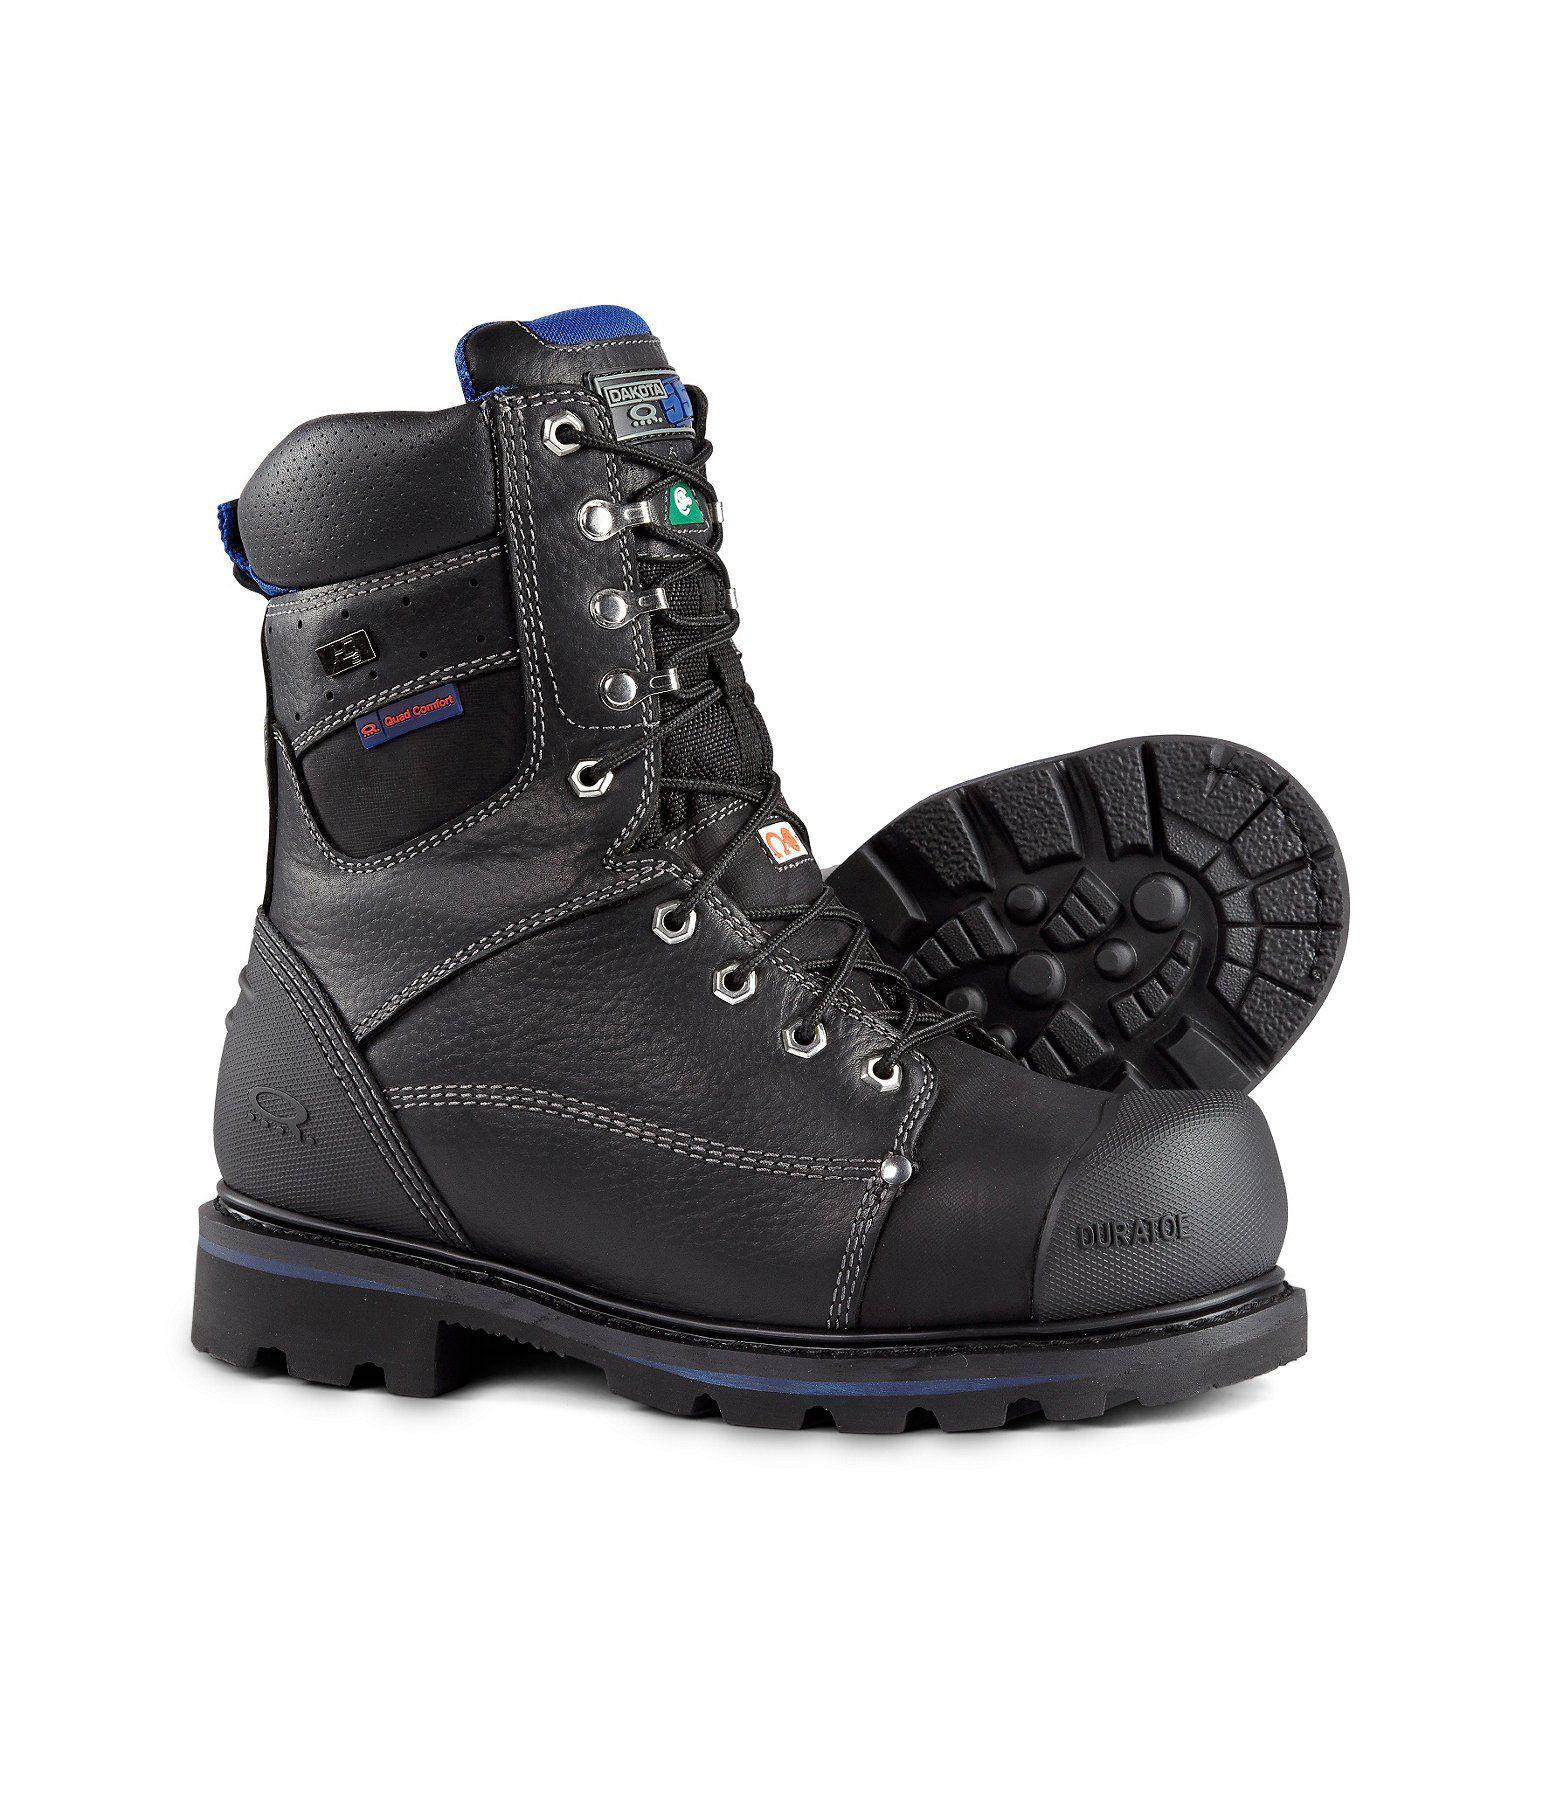 faef850dd27 Men's 8'' 557 Waterproof Vibram Steel Toe Composite Plate Work Boots ...